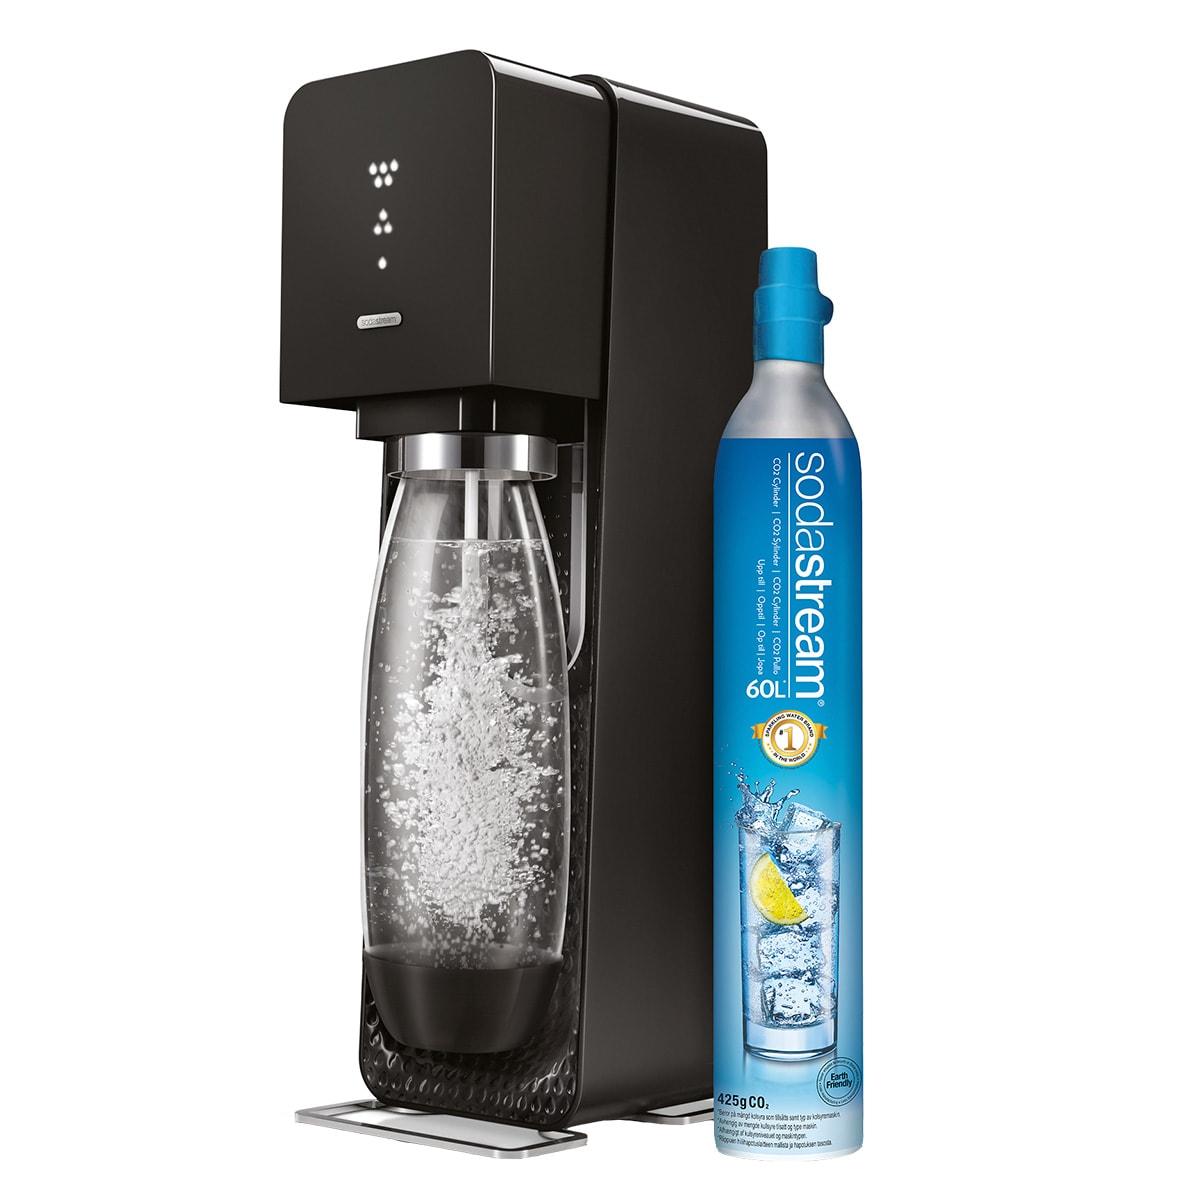 Sodastream maskine med LED-display, der viser kulsyreniveauet